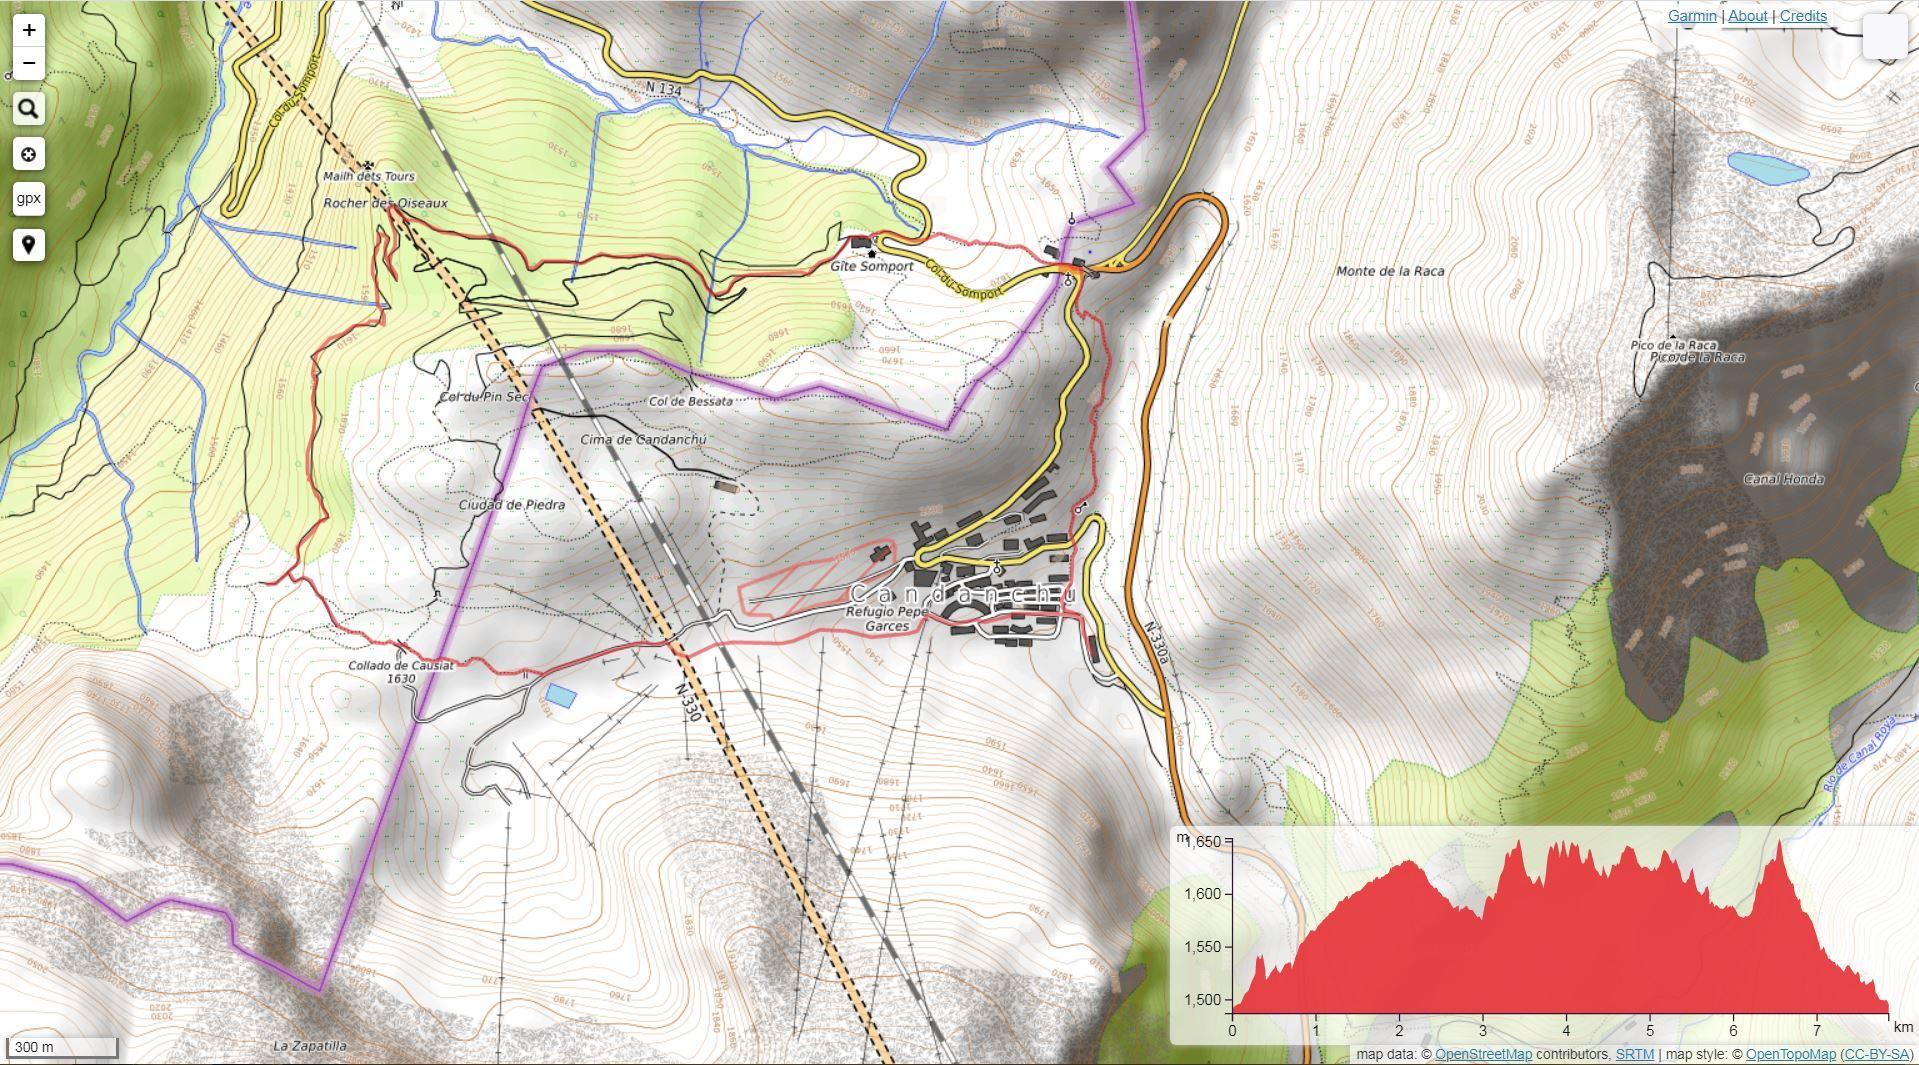 Ruta de montaña en Candanchú - Ruta circular al Somport